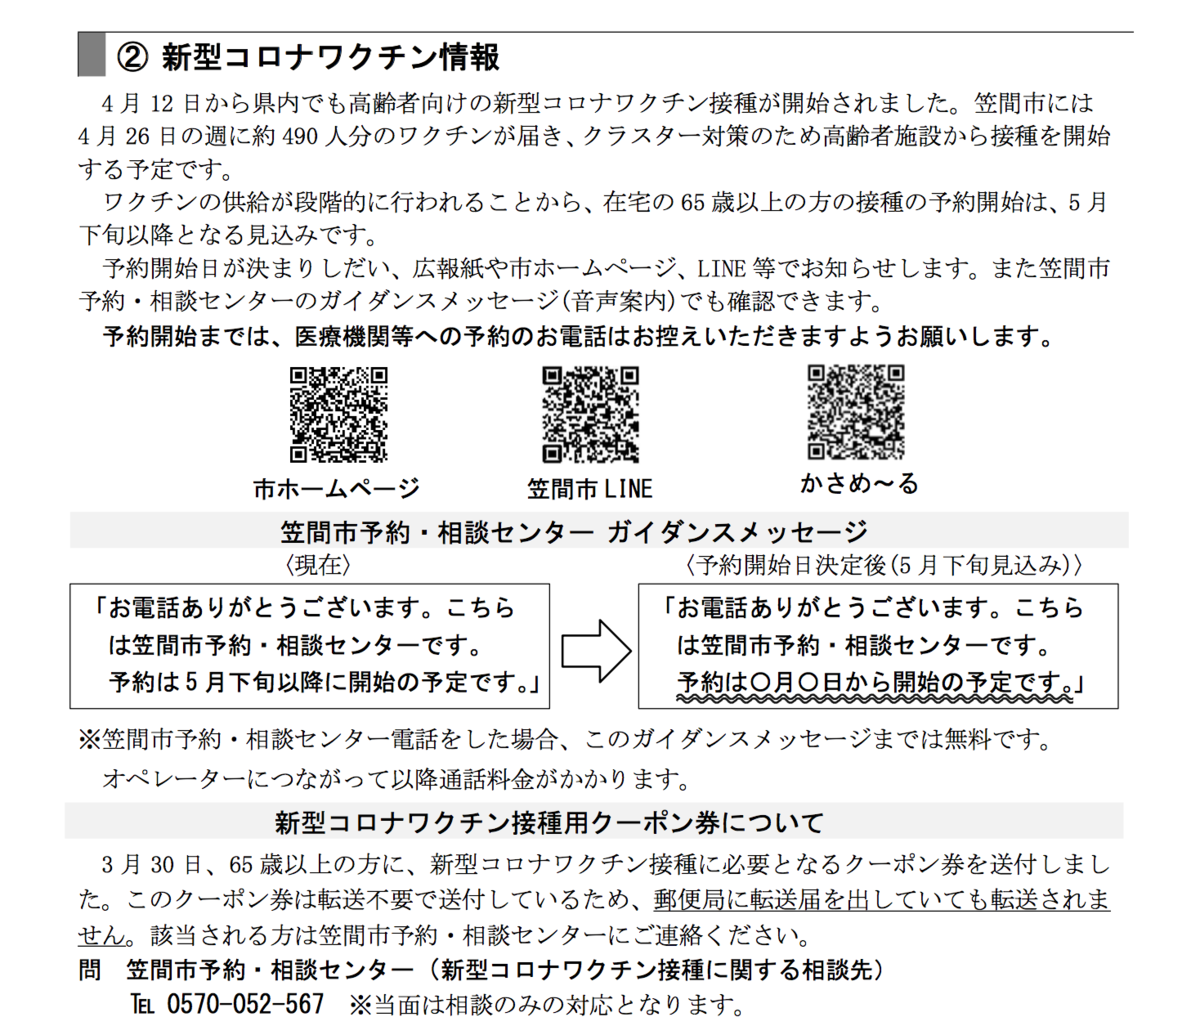 f:id:tomochan0113:20210415101712p:plain